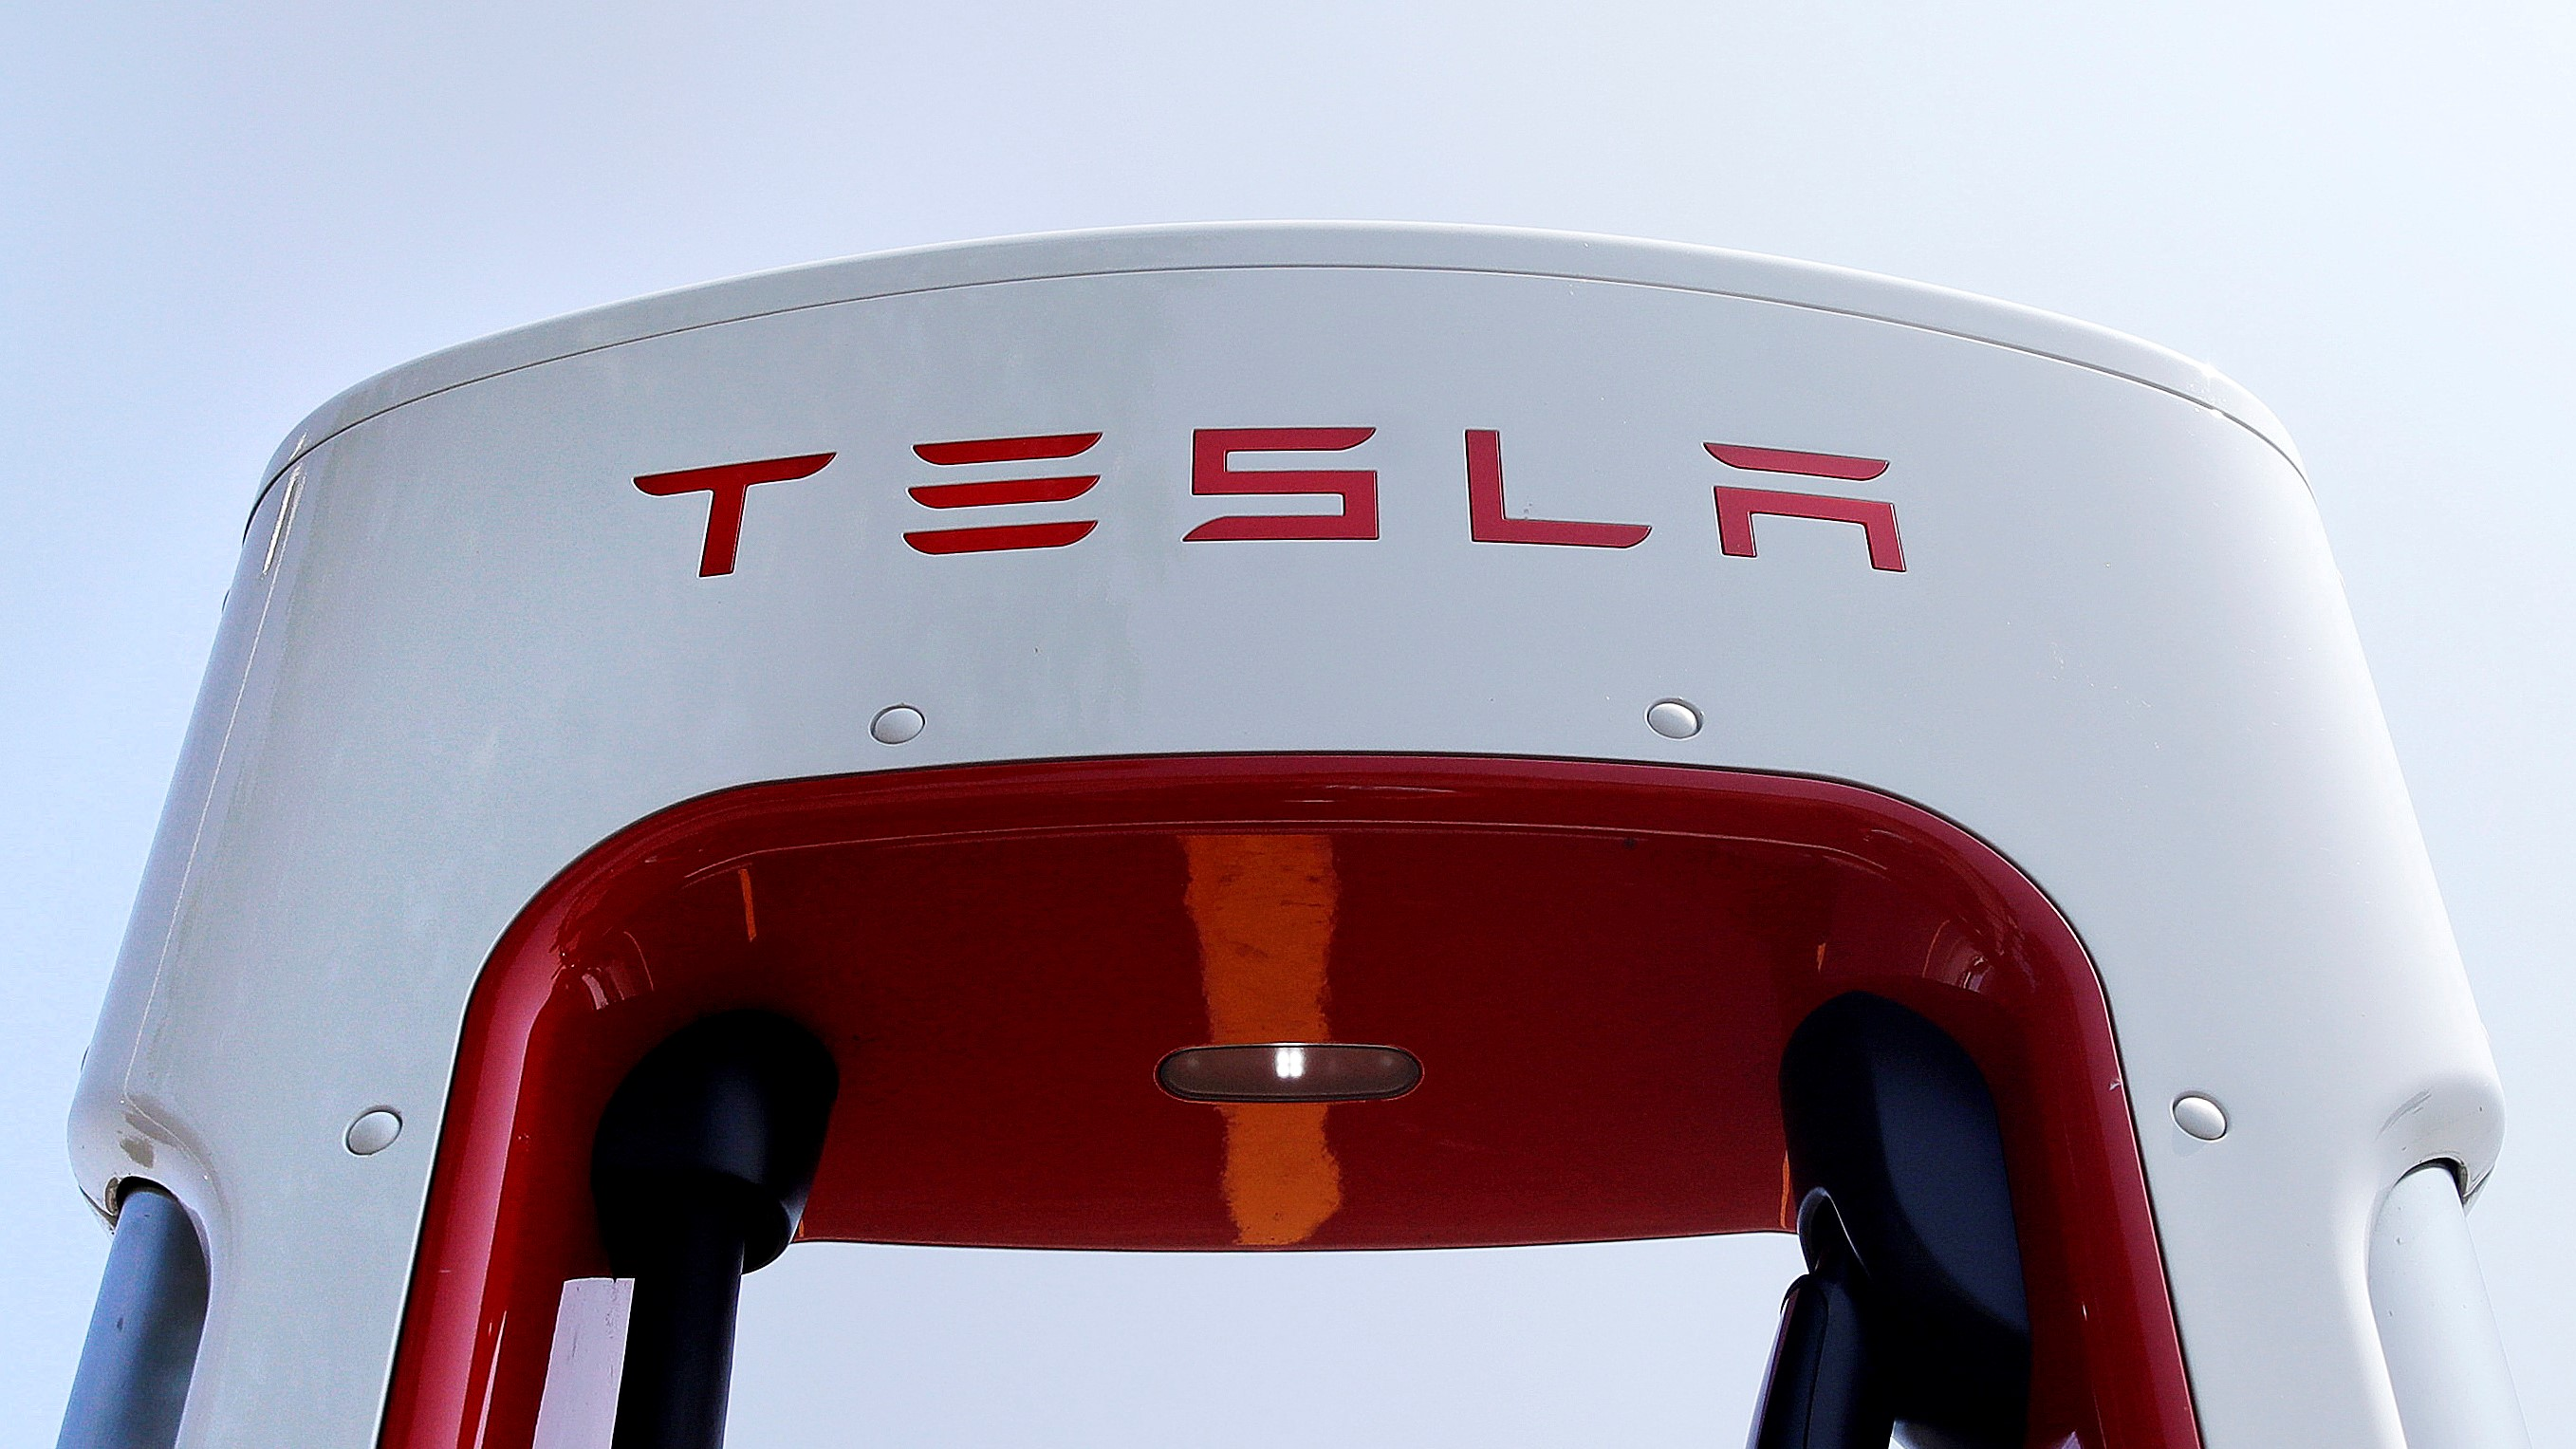 Opinion: Why Tesla's future looks bleak